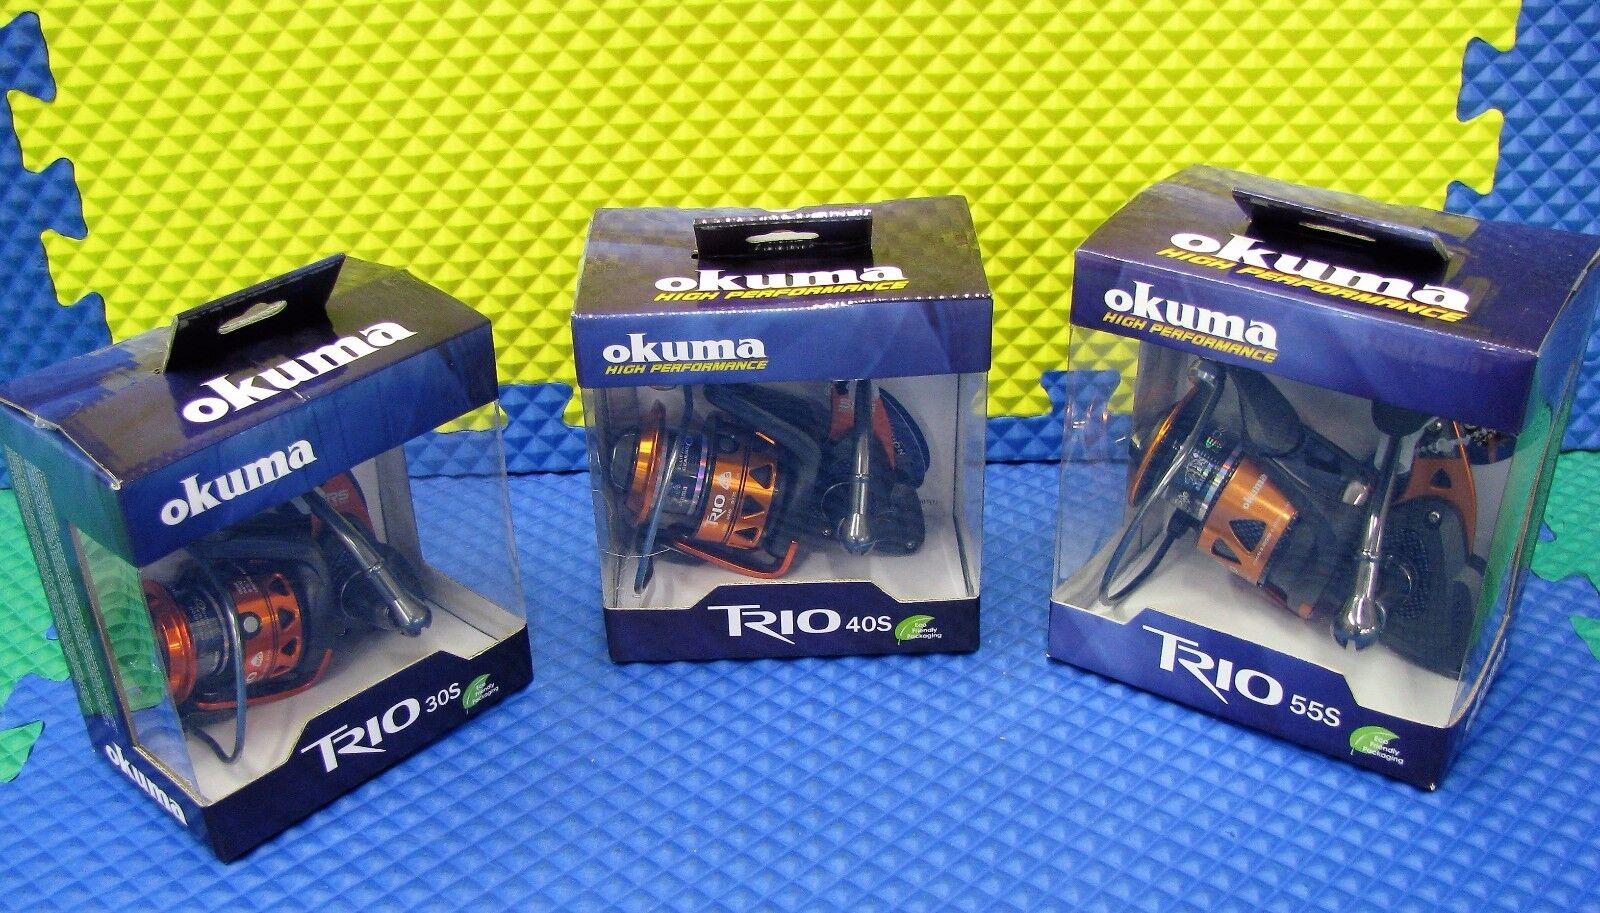 Okuma Trio High Speed Spinning Reels 10BRG CHOOSE YOUR MODEL